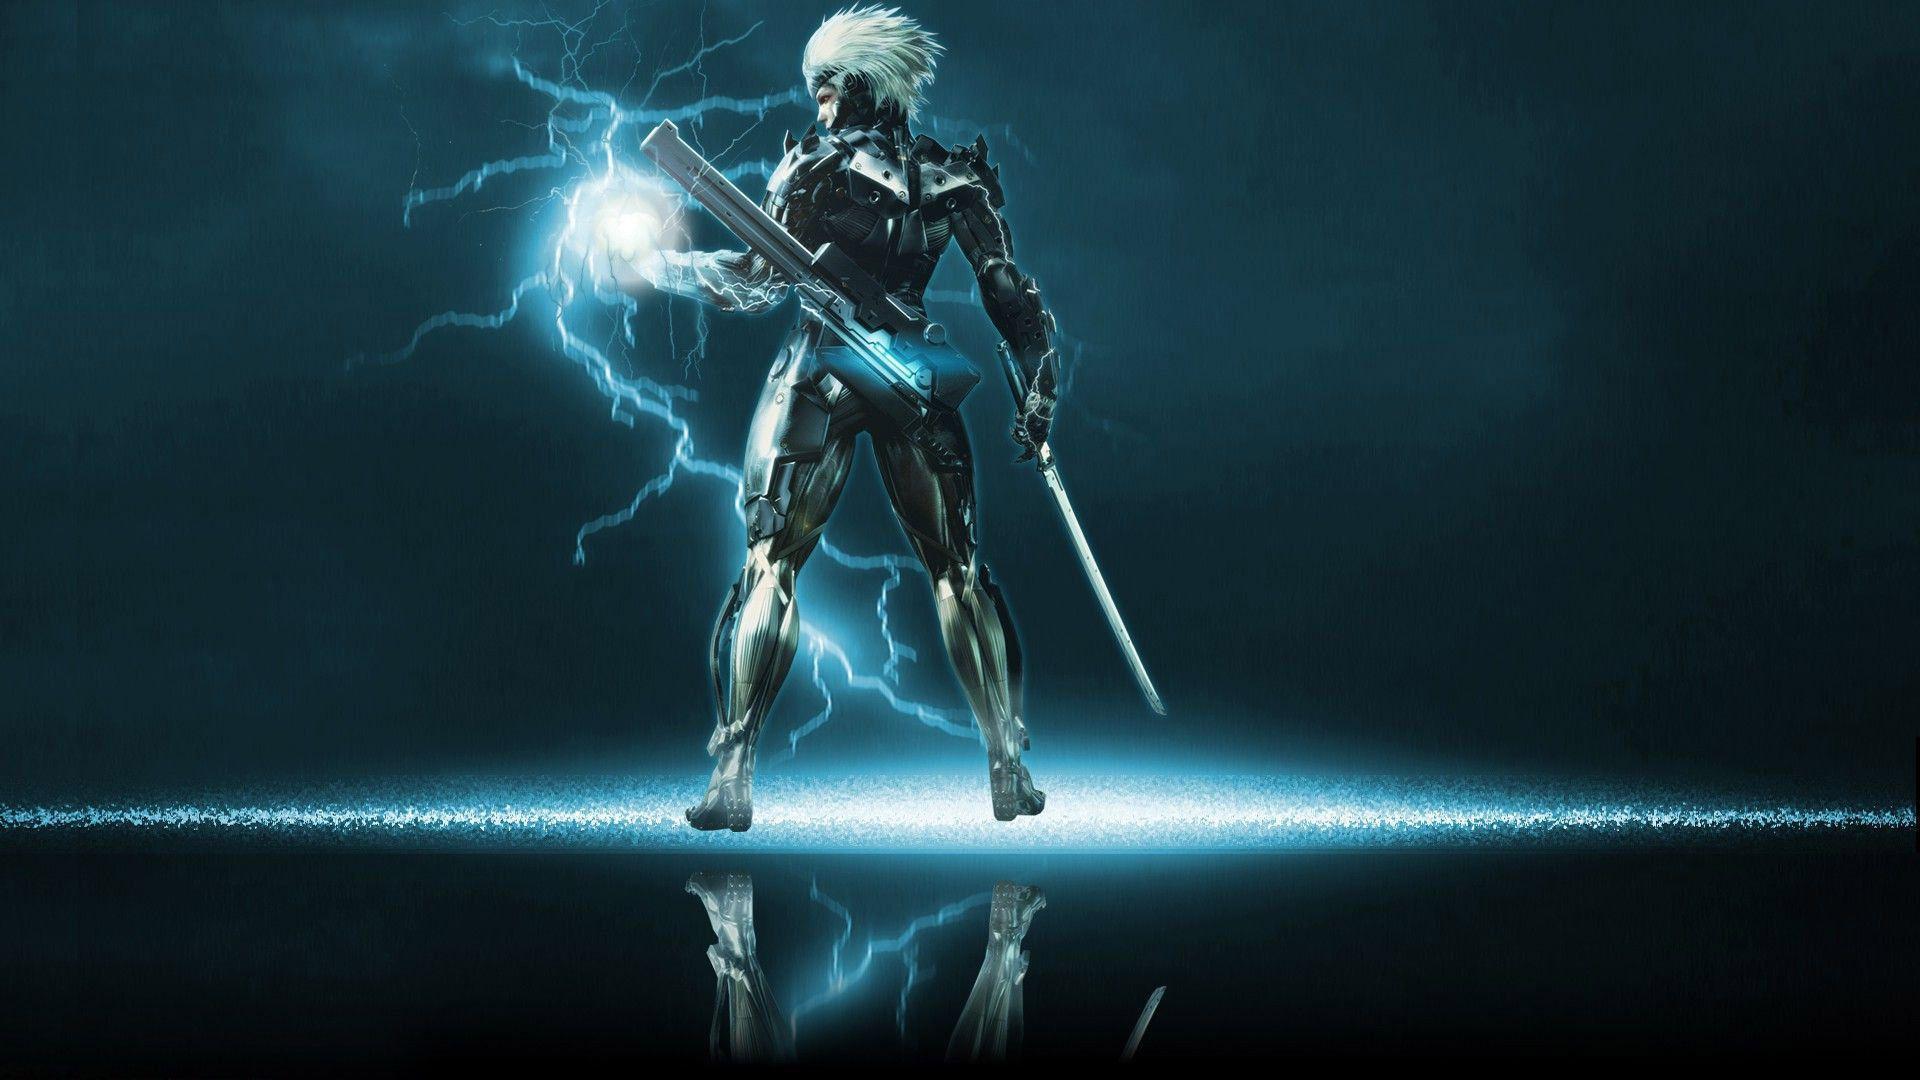 Metal Gear Solid Raiden Wallpaper